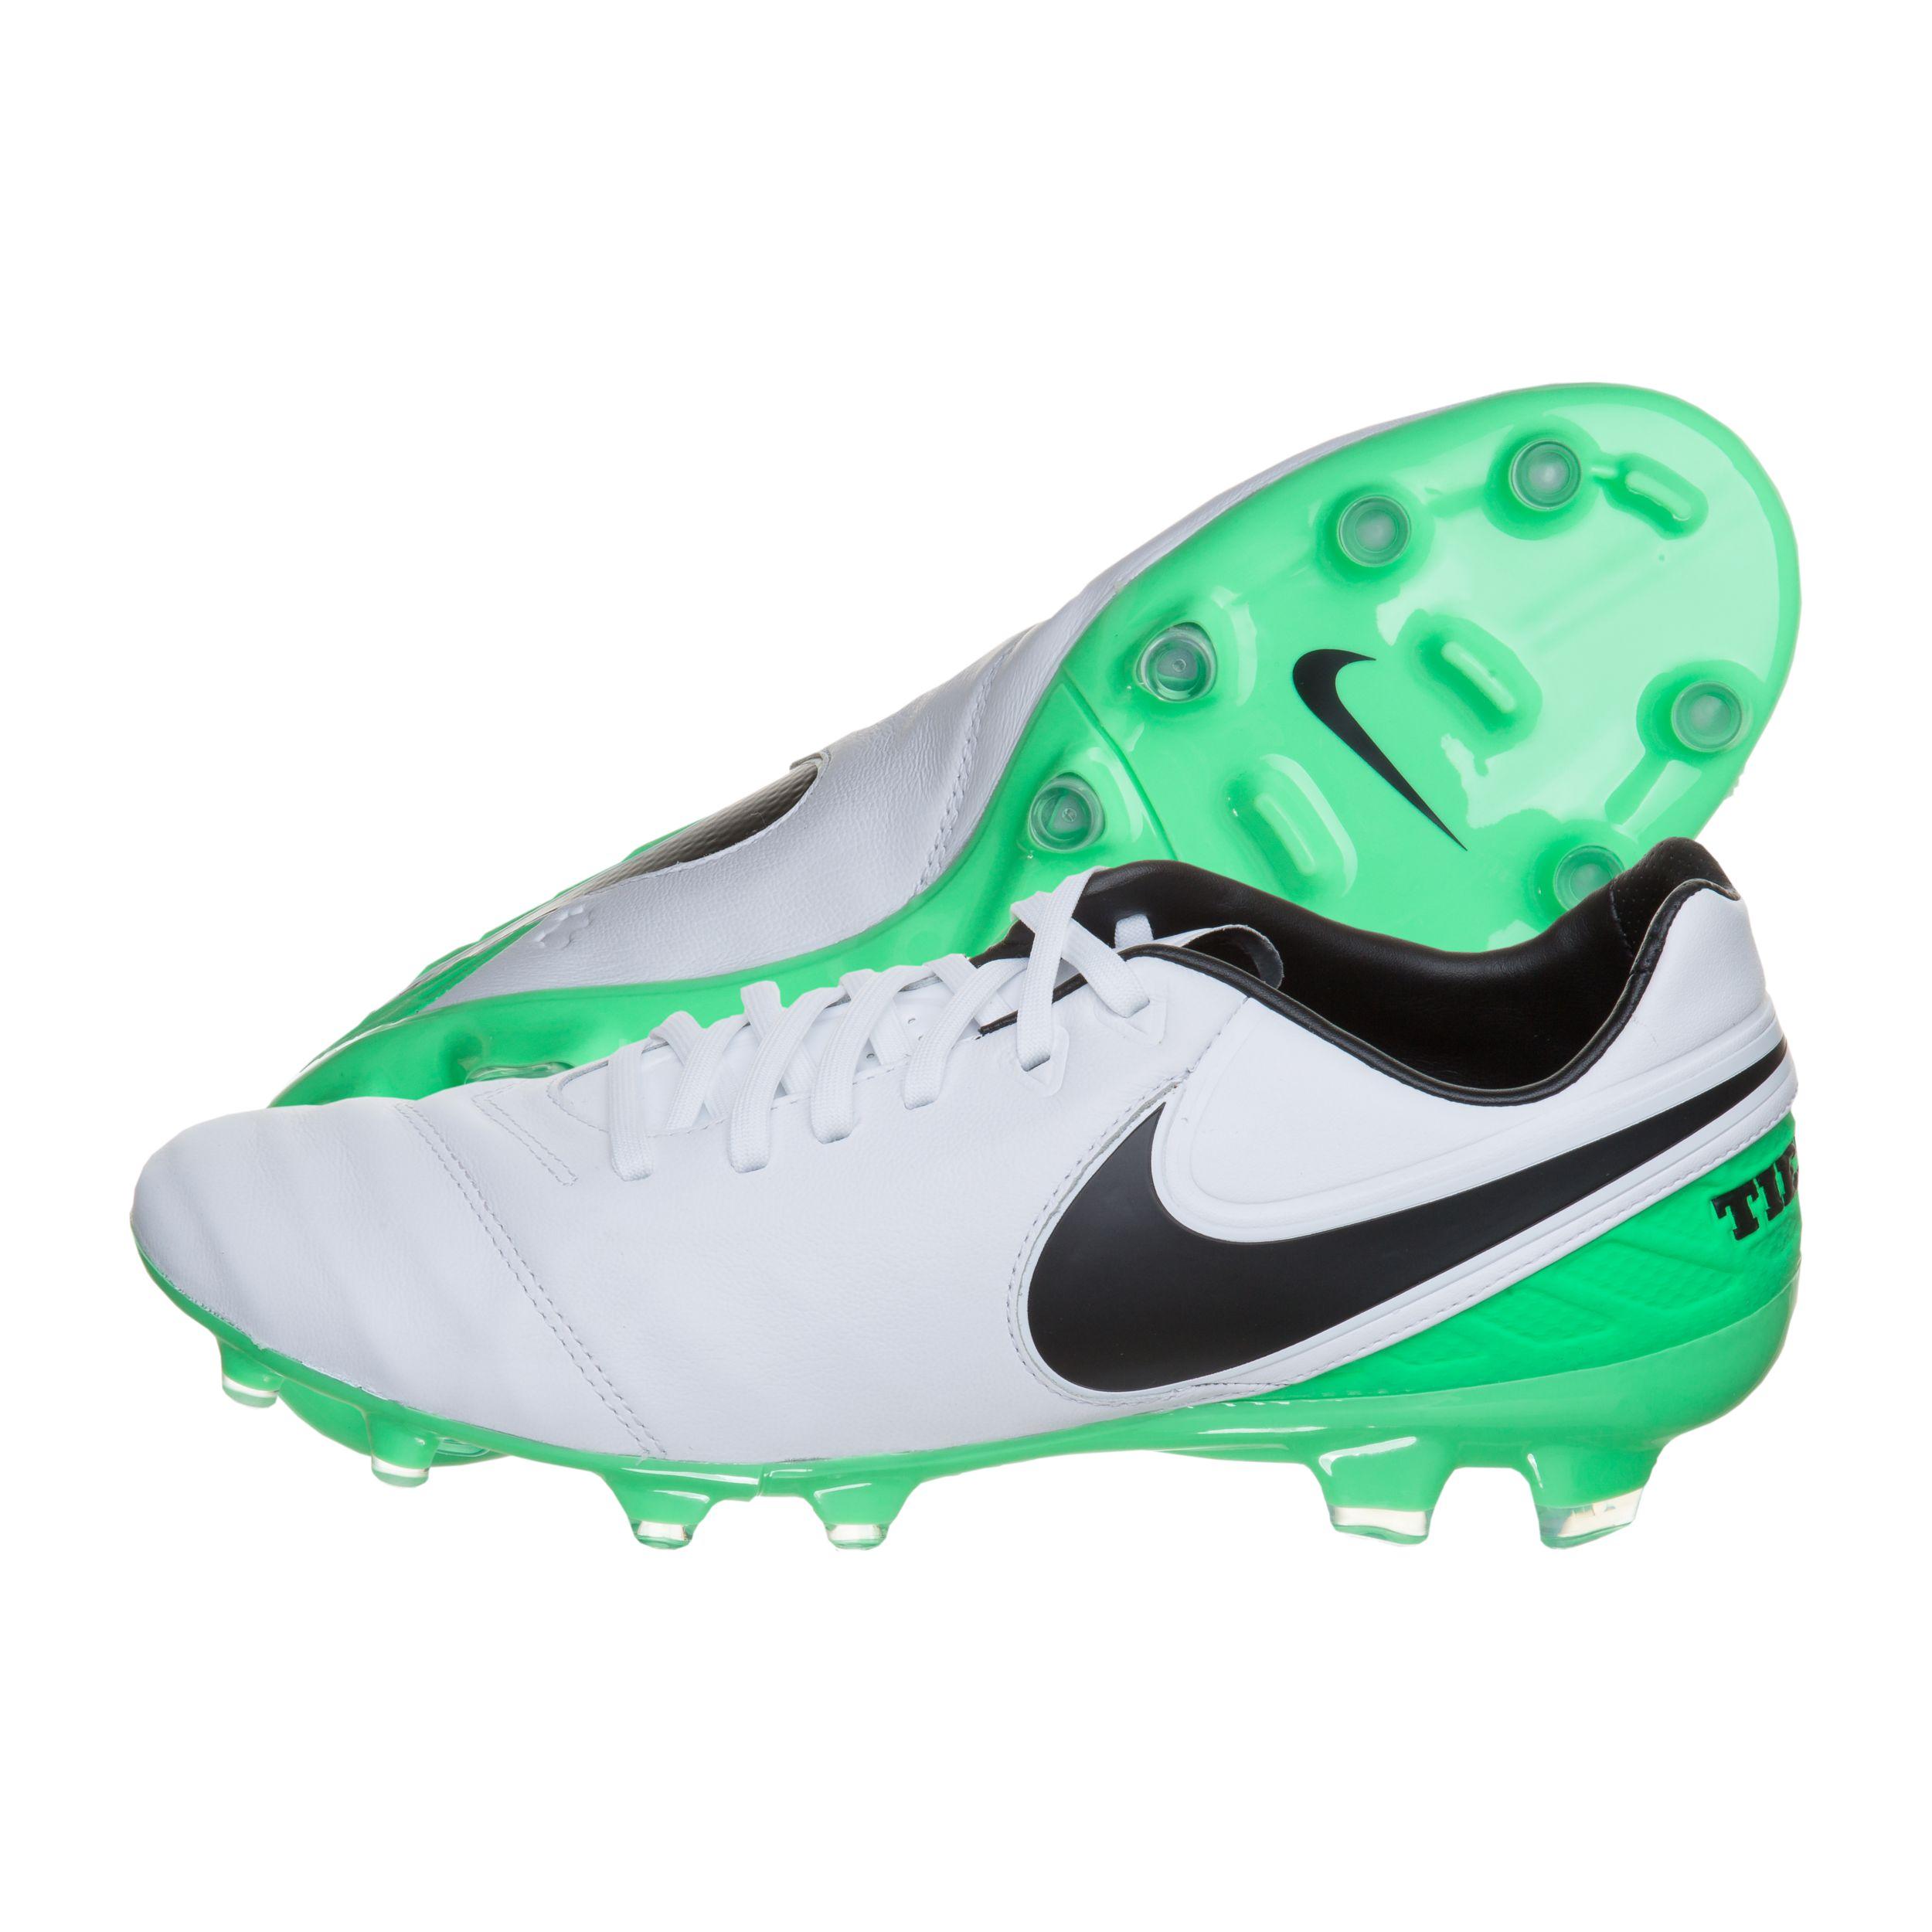 brand new 66fa5 398ab Teamsport Philipp | Nike Tiempo Legacy II FG 819218-103 | günstig ...